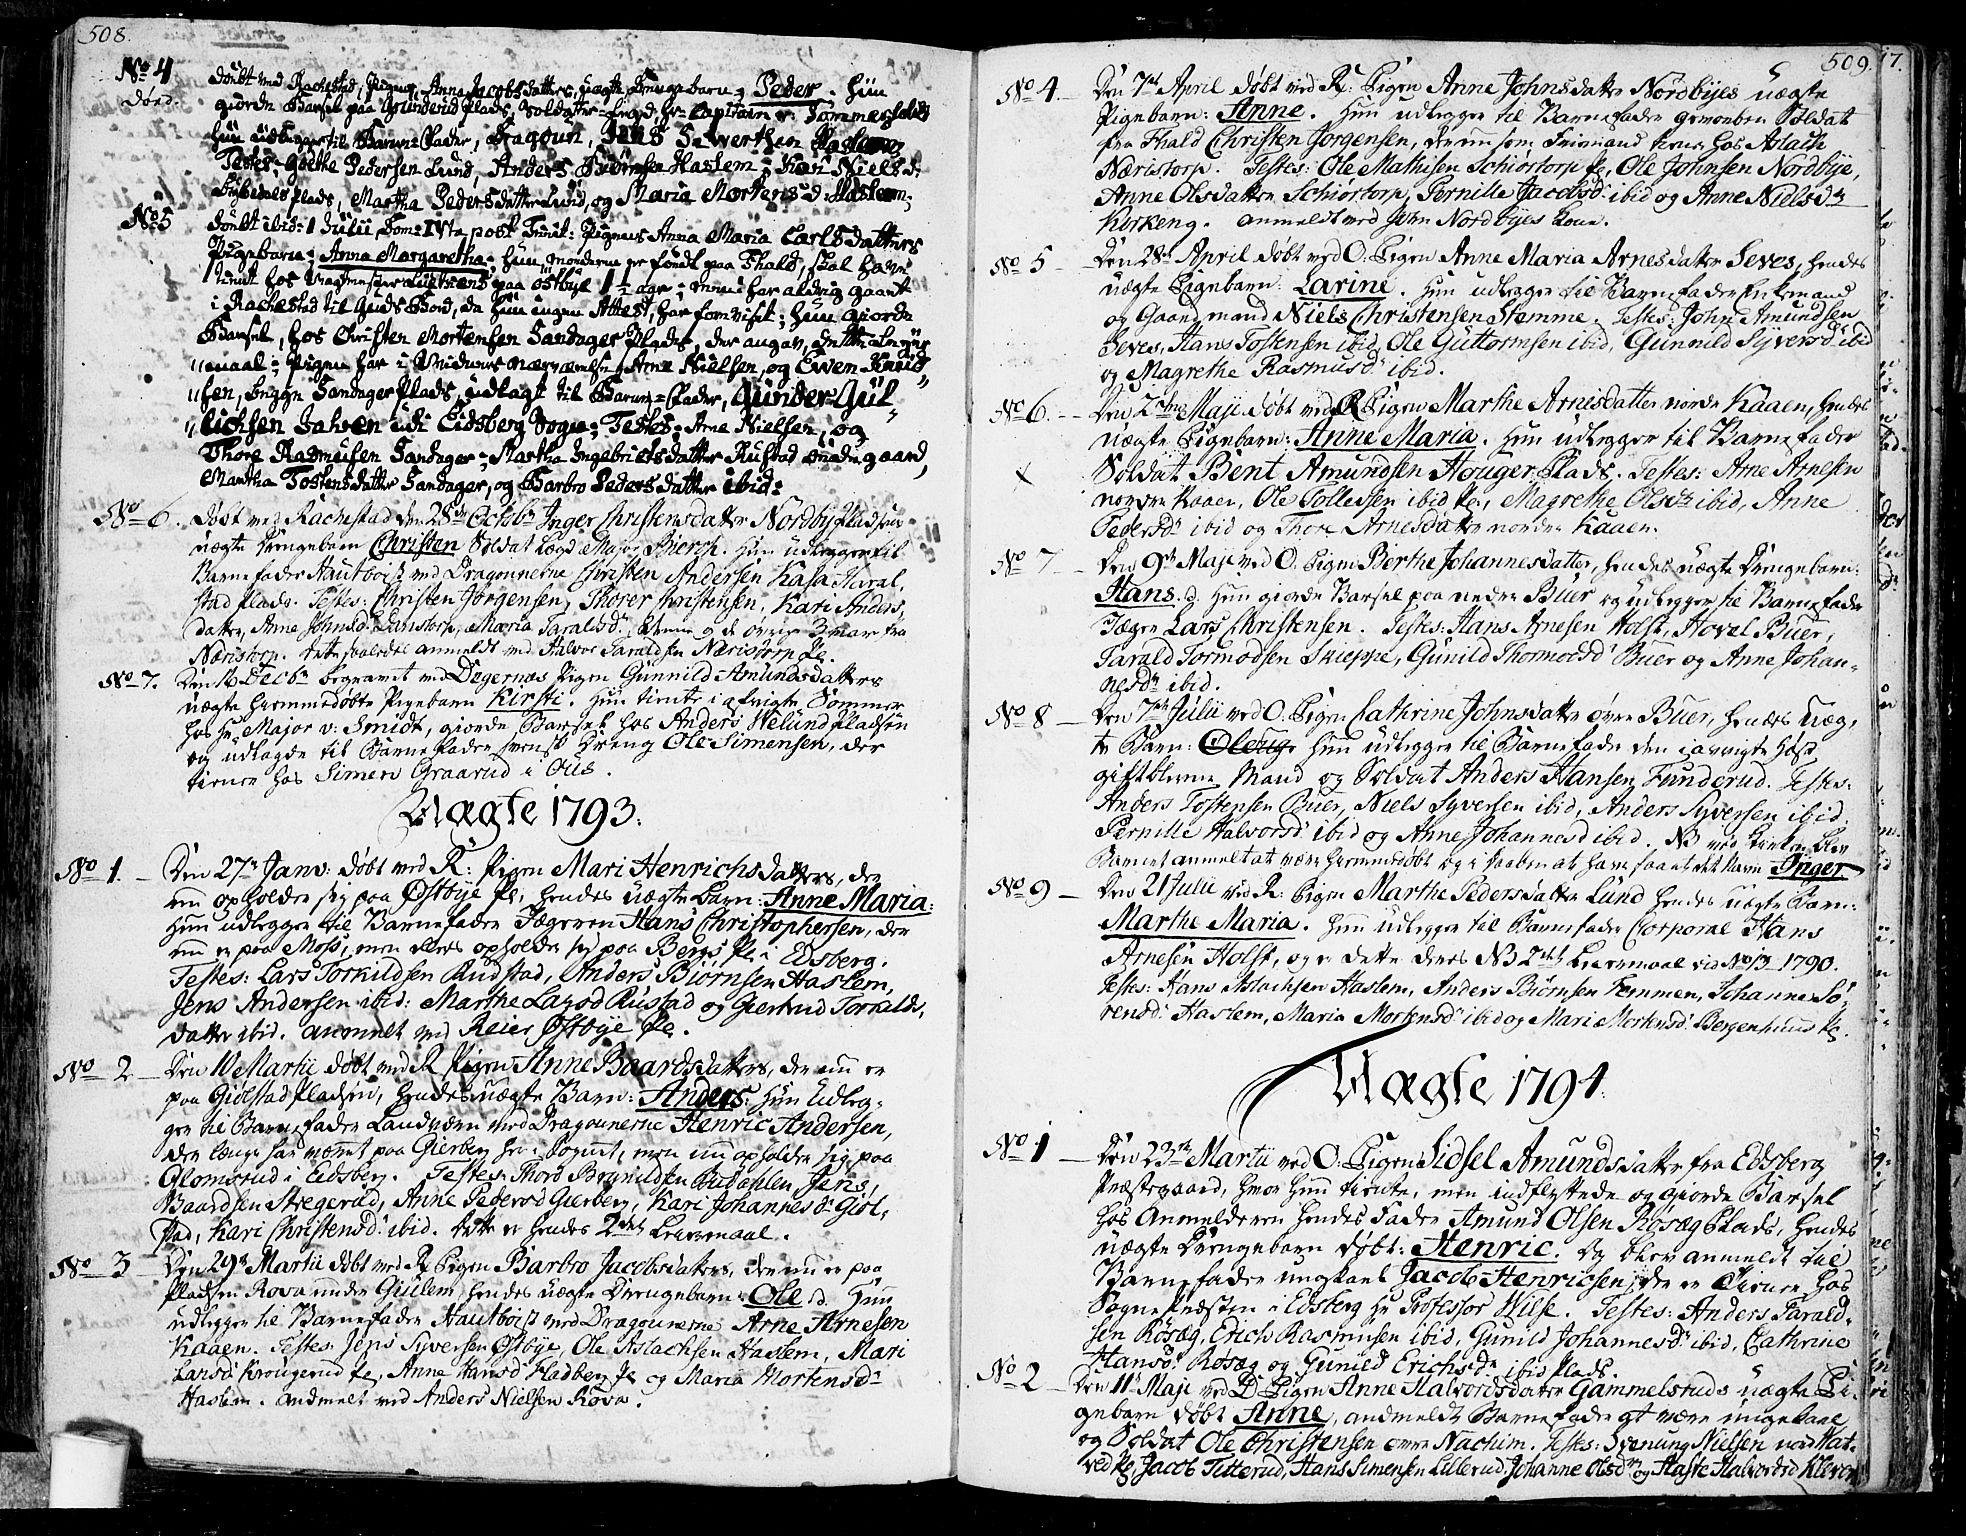 SAO, Rakkestad prestekontor Kirkebøker, F/Fa/L0005: Ministerialbok nr. I 5, 1784-1814, s. 508-509